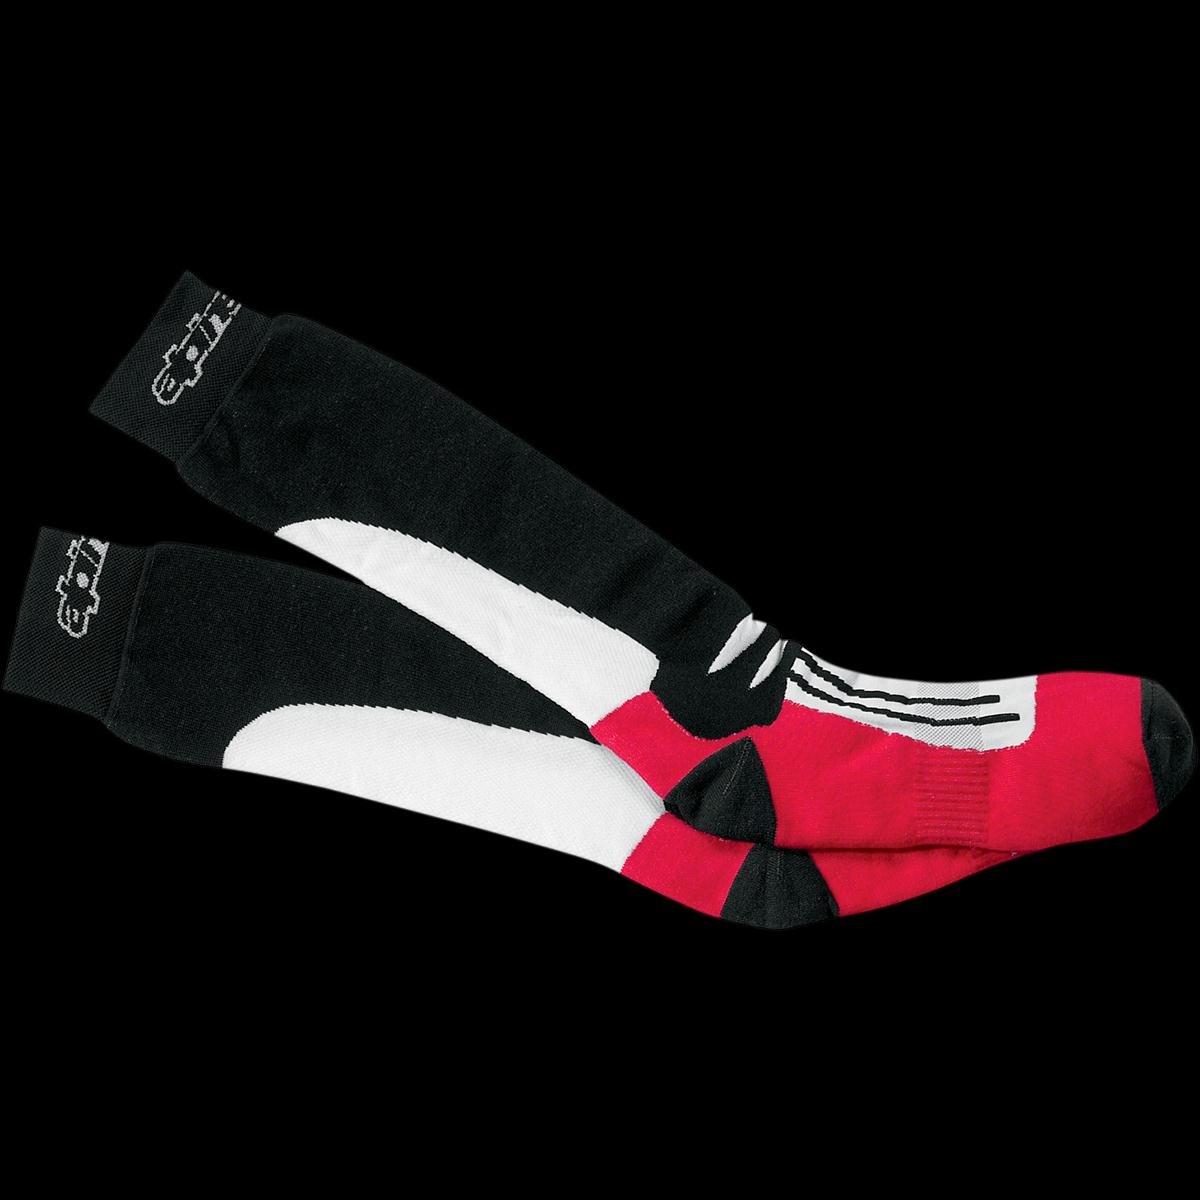 Alpinestars Road Racing Socks - Mid-Calf Length , Size: Sm-Md, Size Modifier: 7-9, Gender: Mens/Unisex, Primary Color: Black 470308-30-SM